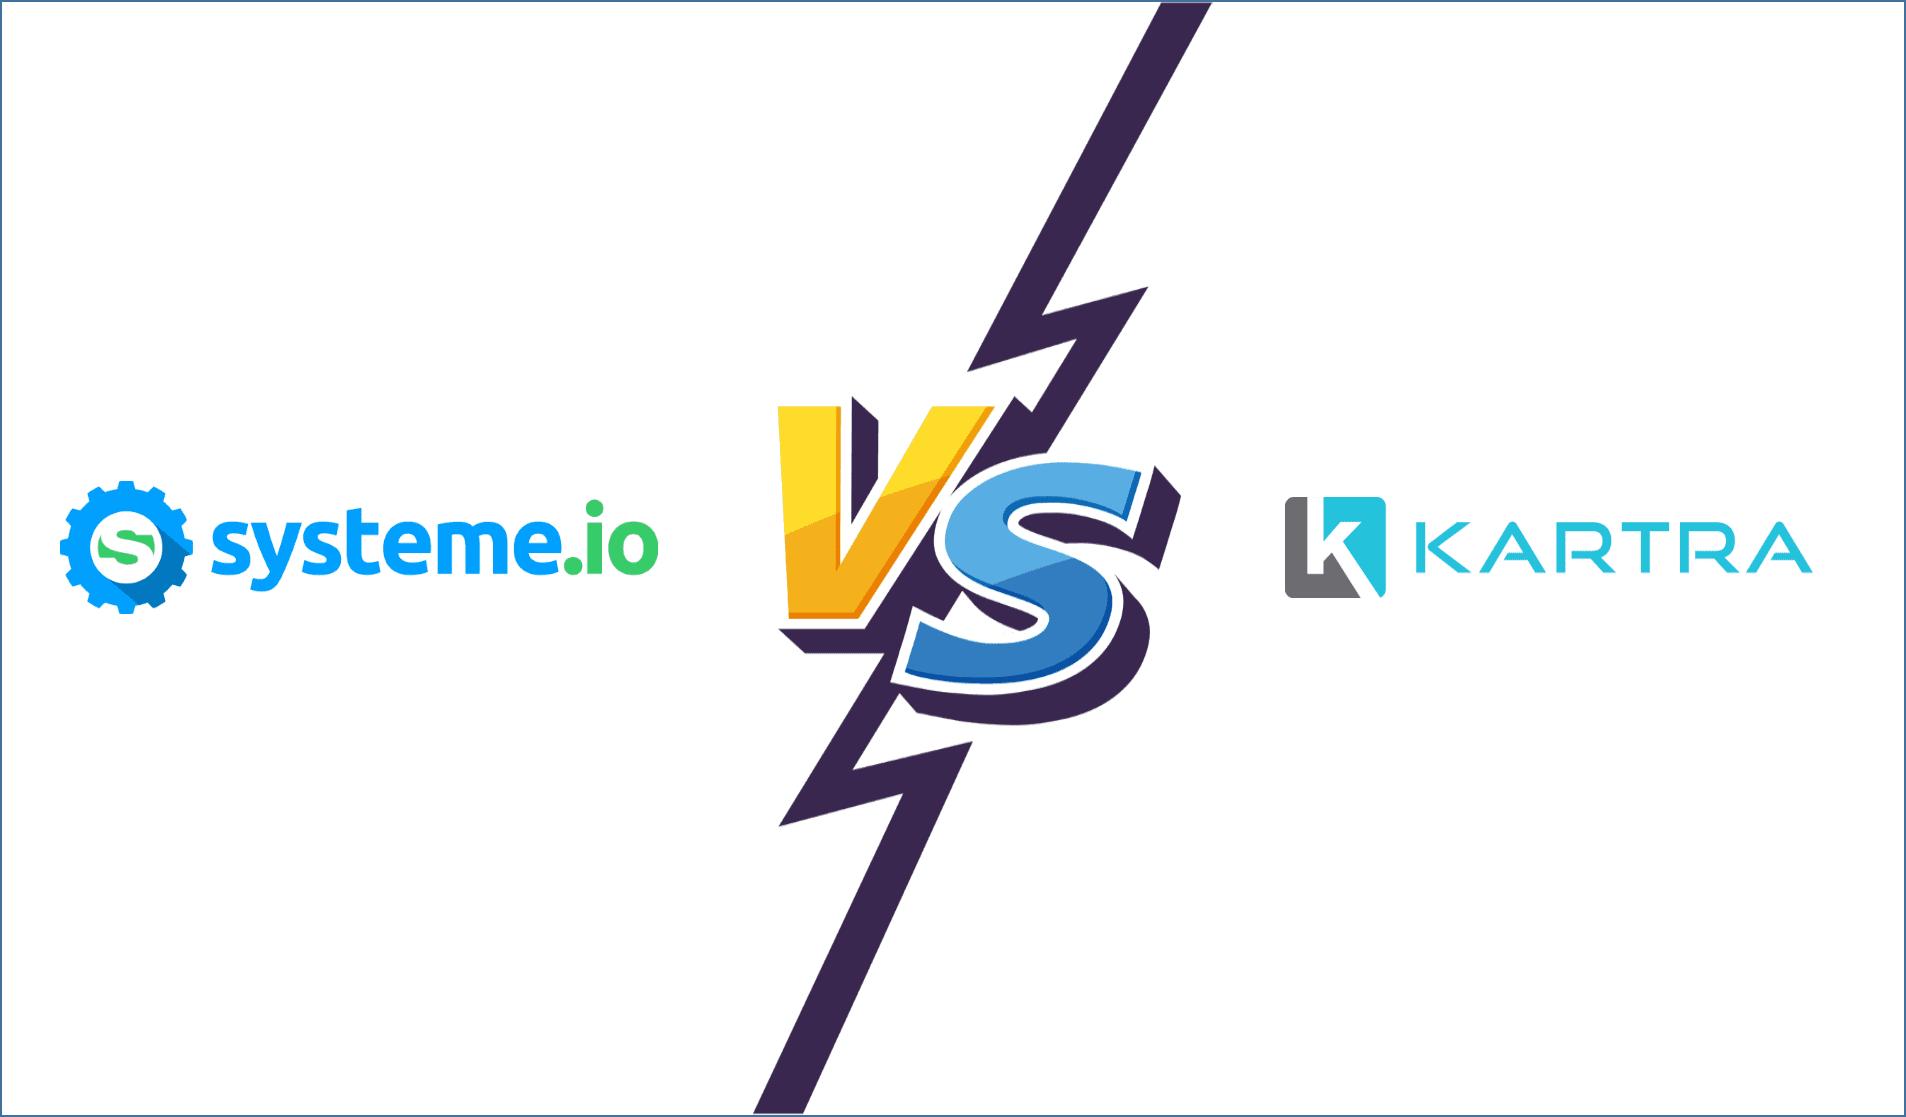 Kartra vs Systeme.io